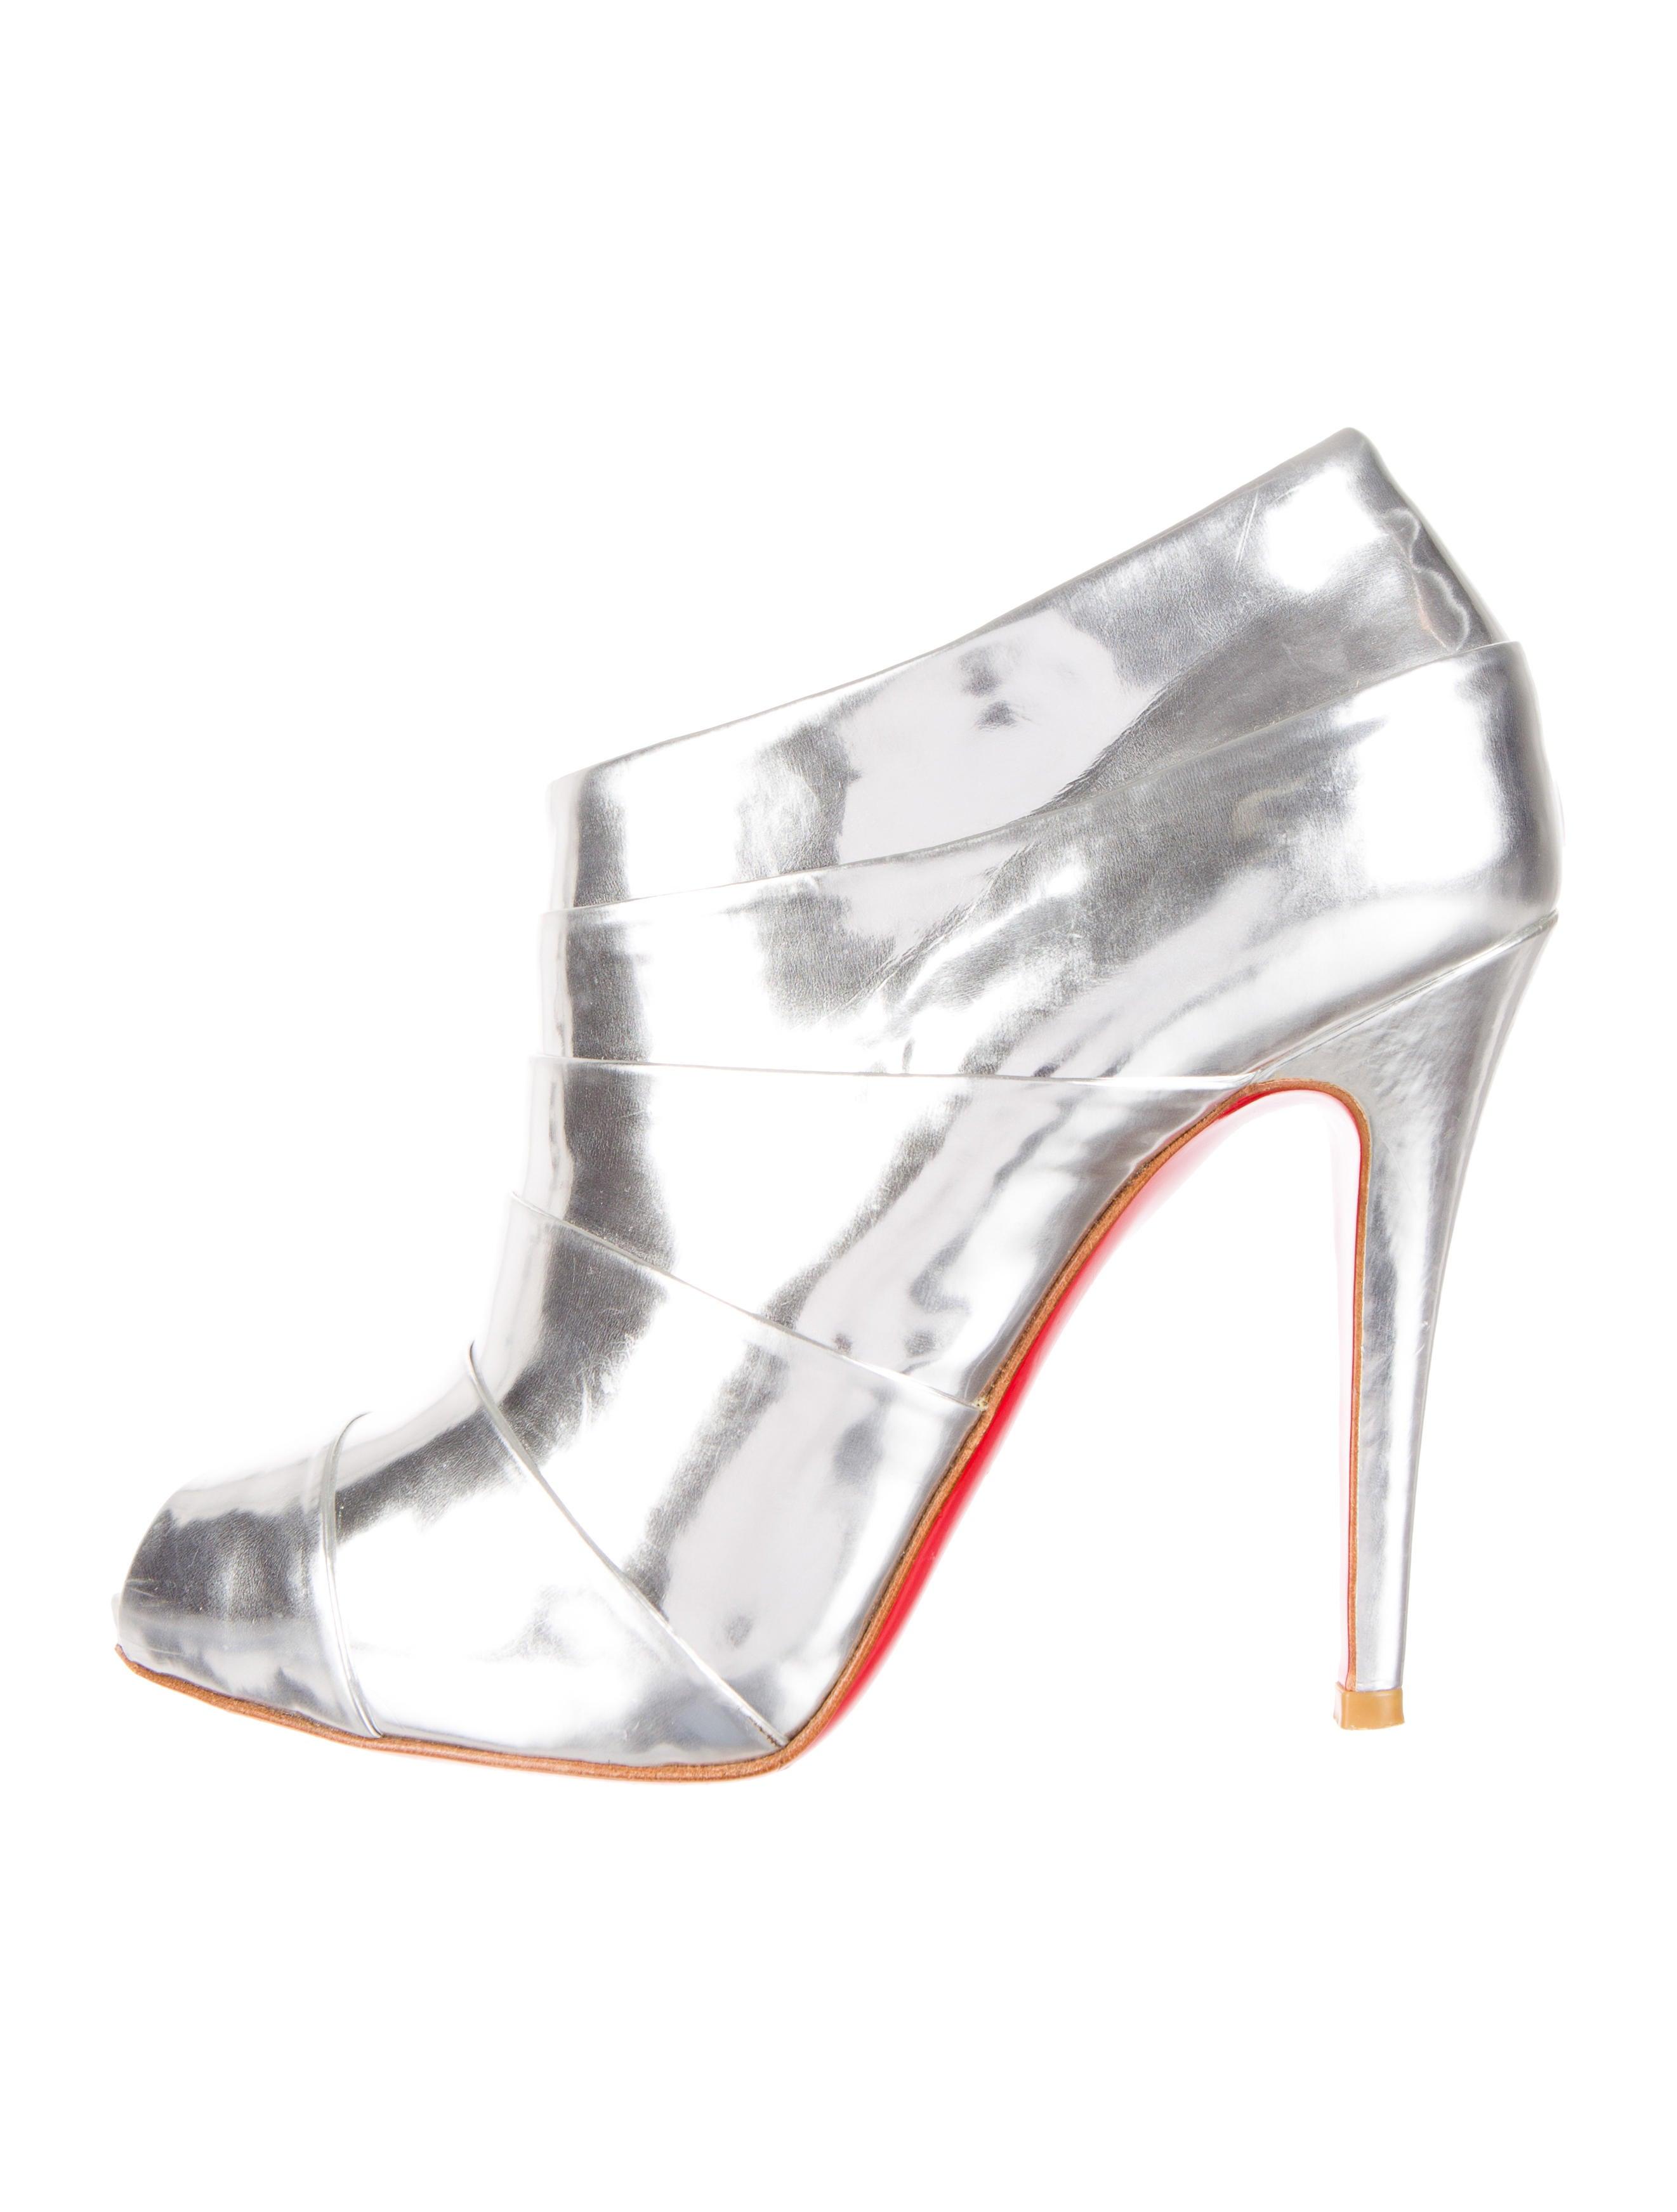 christian louboutin Armadillo booties Silver mirrored leather peep ...